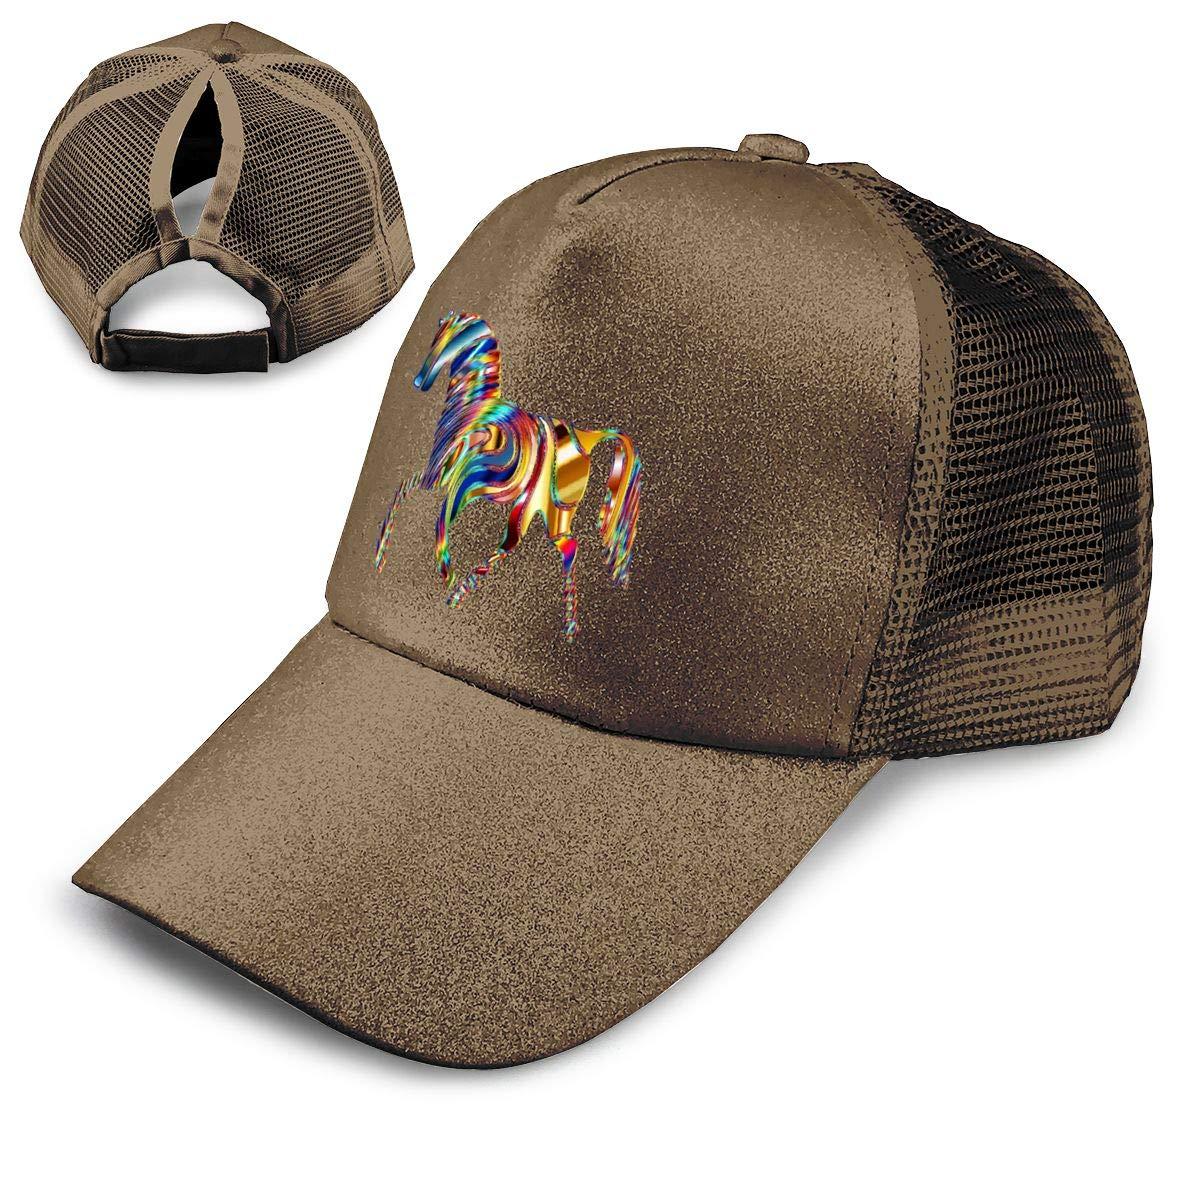 Horse Animal Ponytail Messy High Bun Hat Ponycaps Baseball Cap Adjustable Trucker Cap Mesh Cap